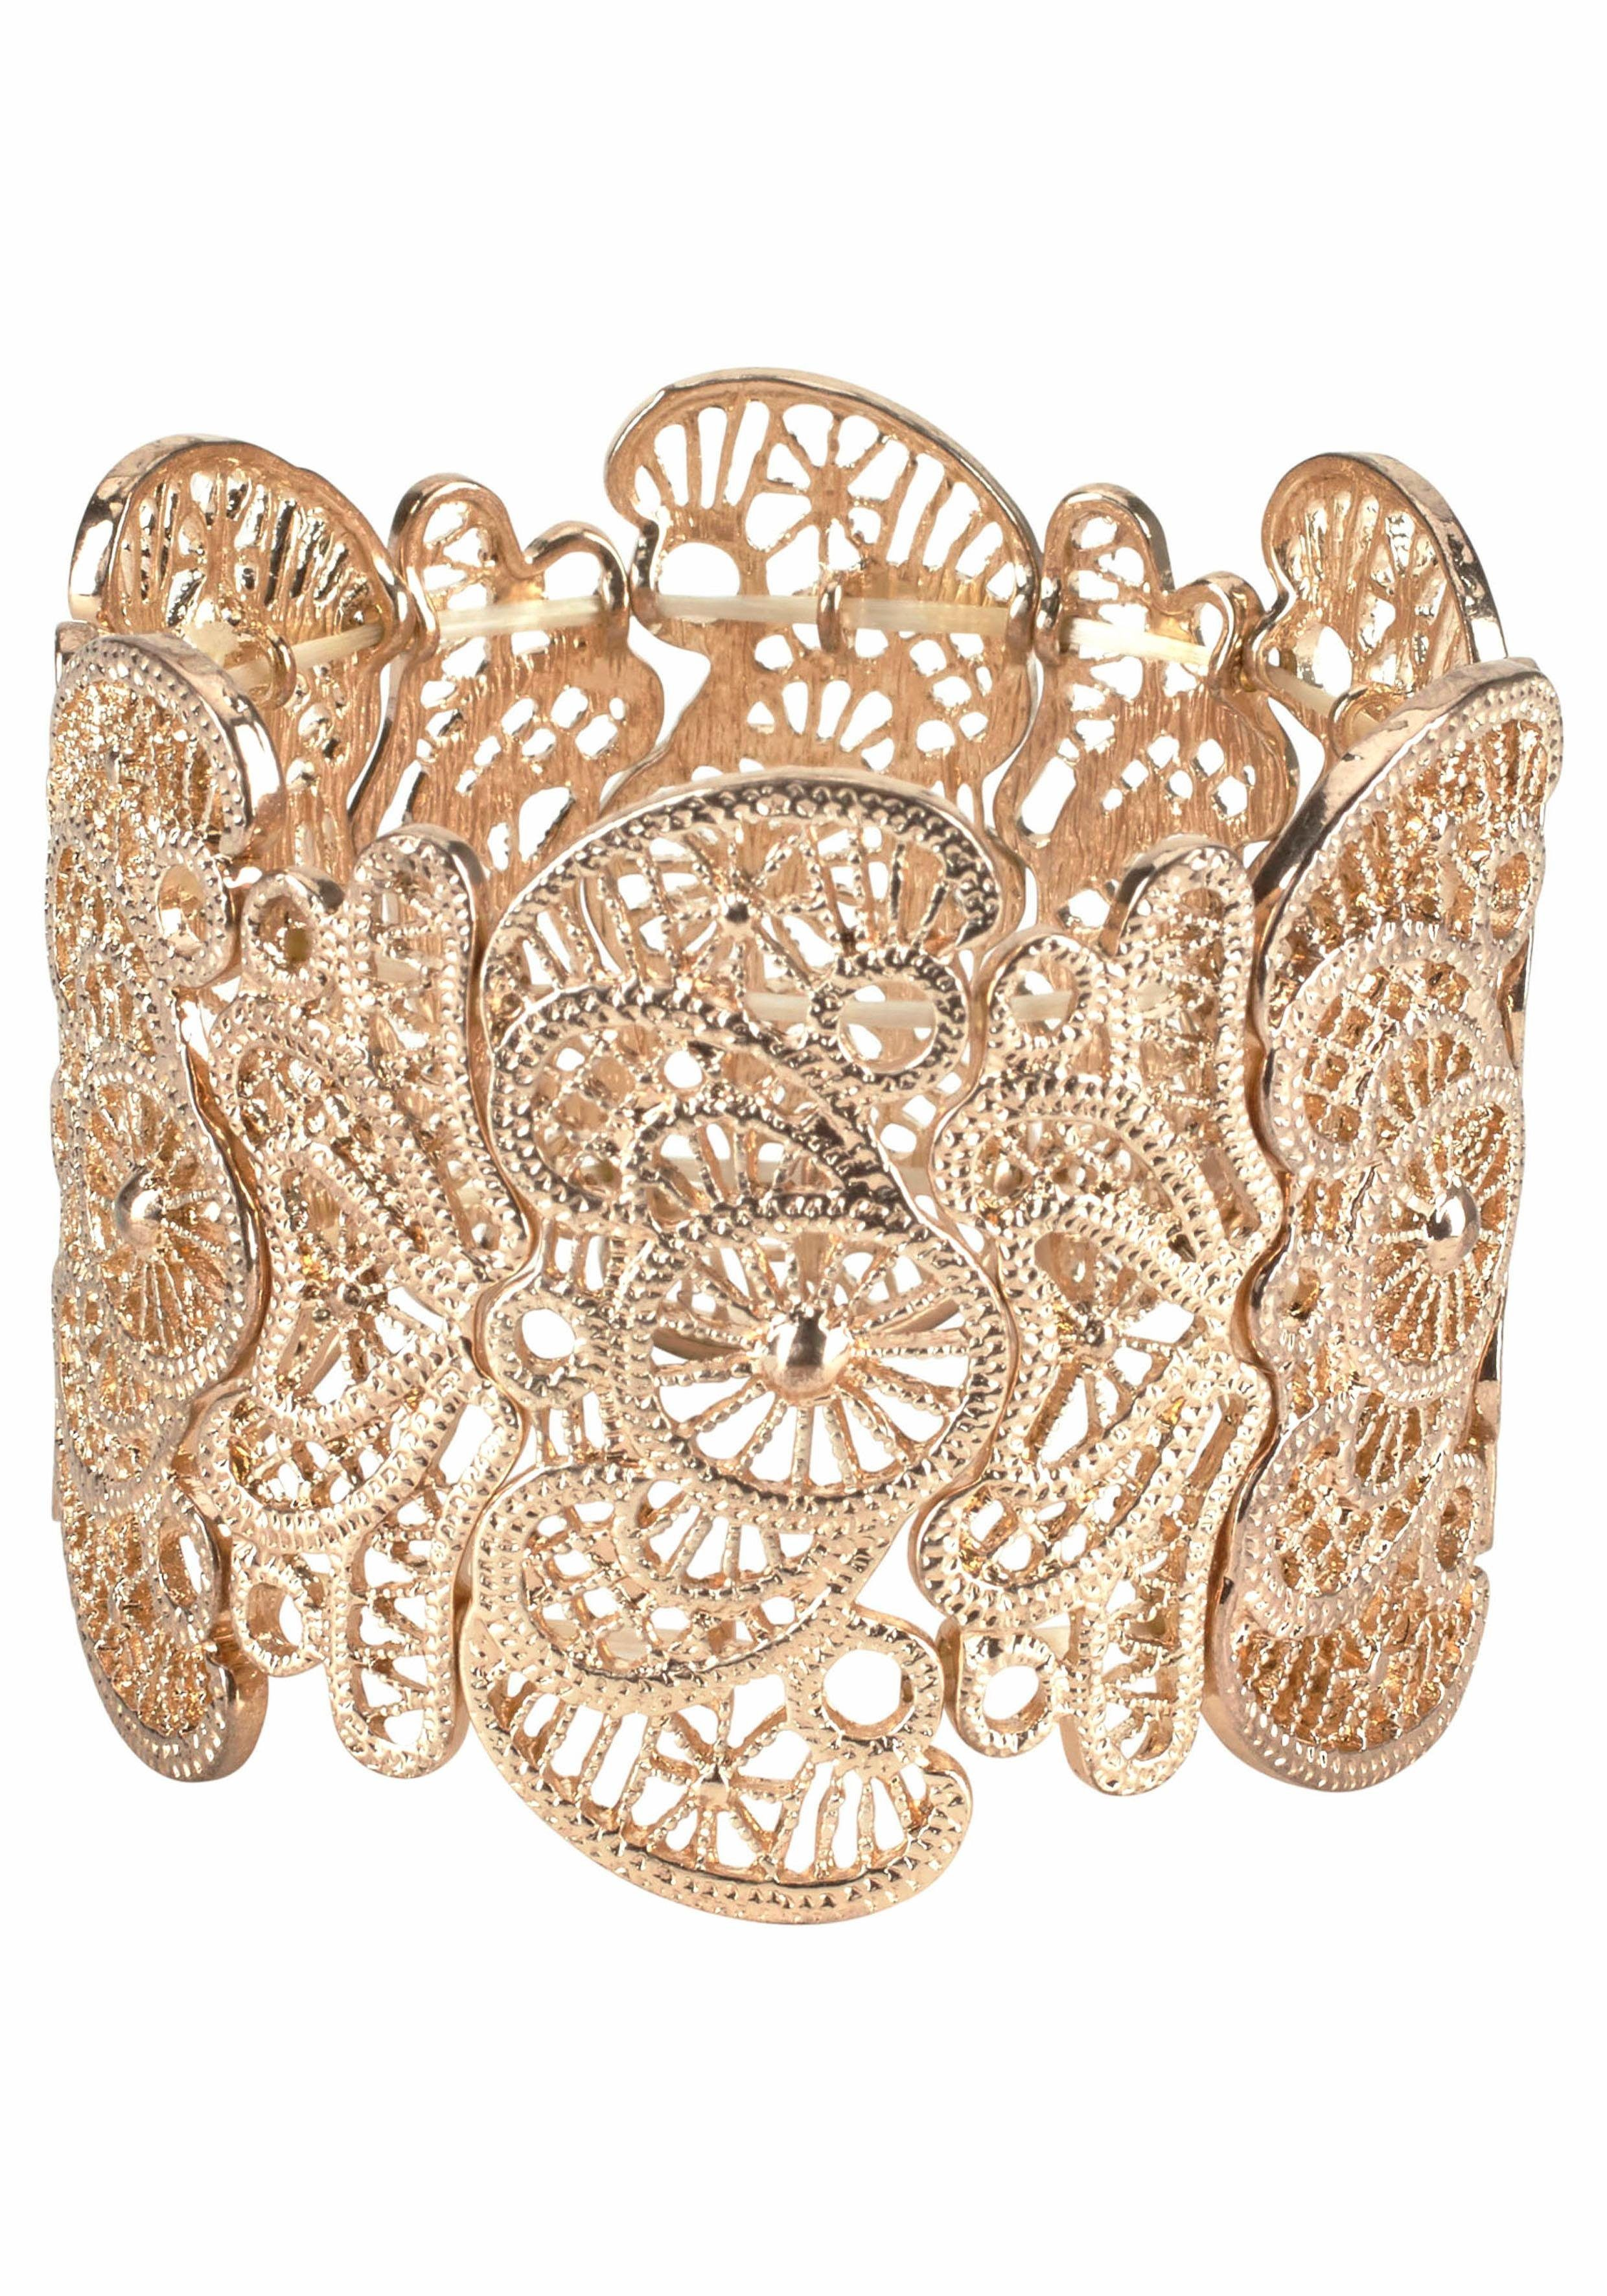 J. Jayz Armband im eleganten Design